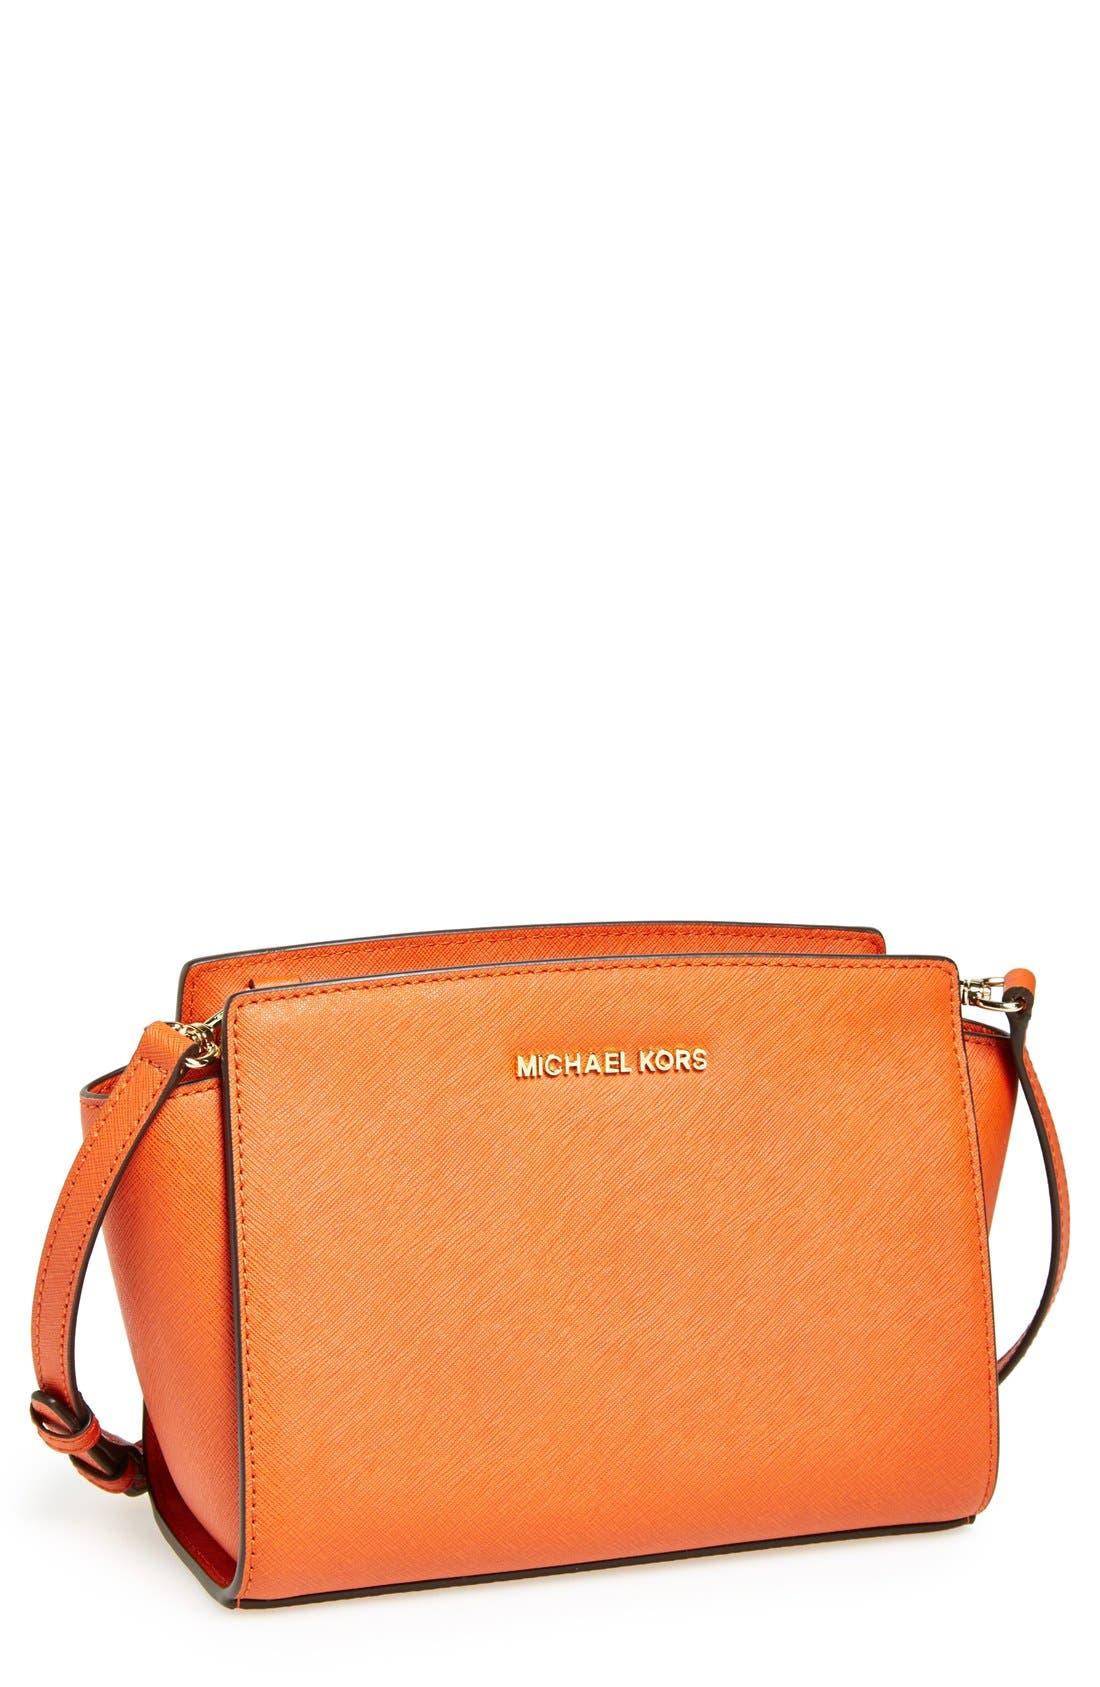 Main Image - MICHAEL Michael Kors 'Medium Selma' Saffiano Leather Crossbody Bag